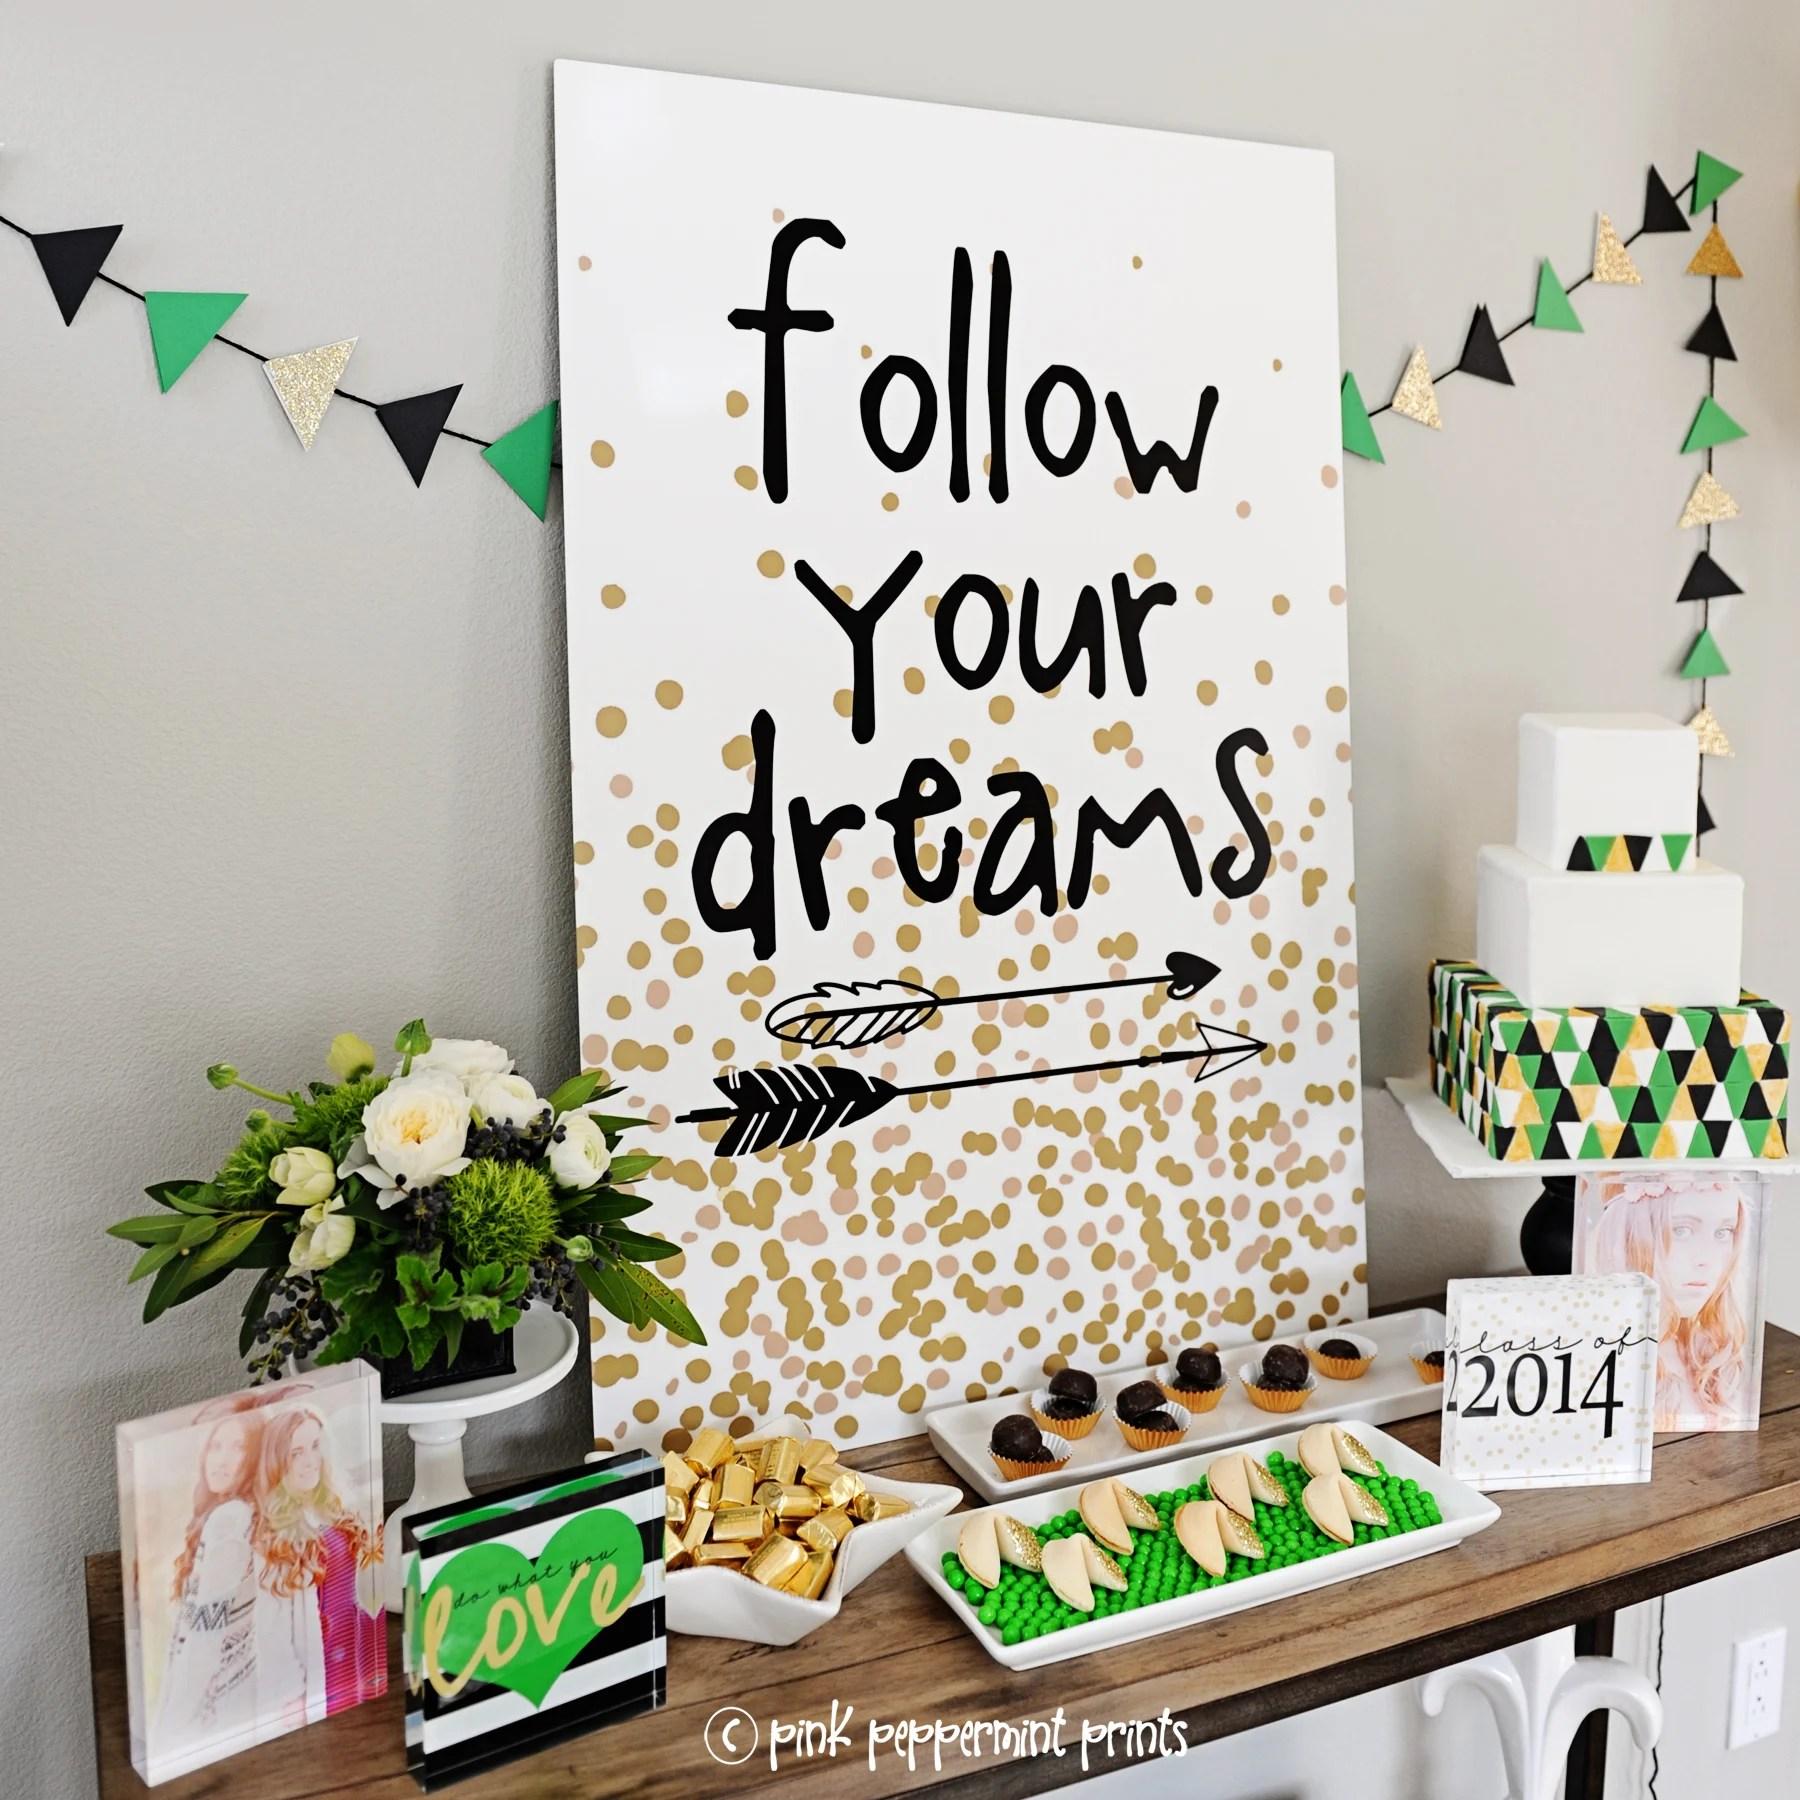 FUN High School Graduation Party Ideas & Decorations